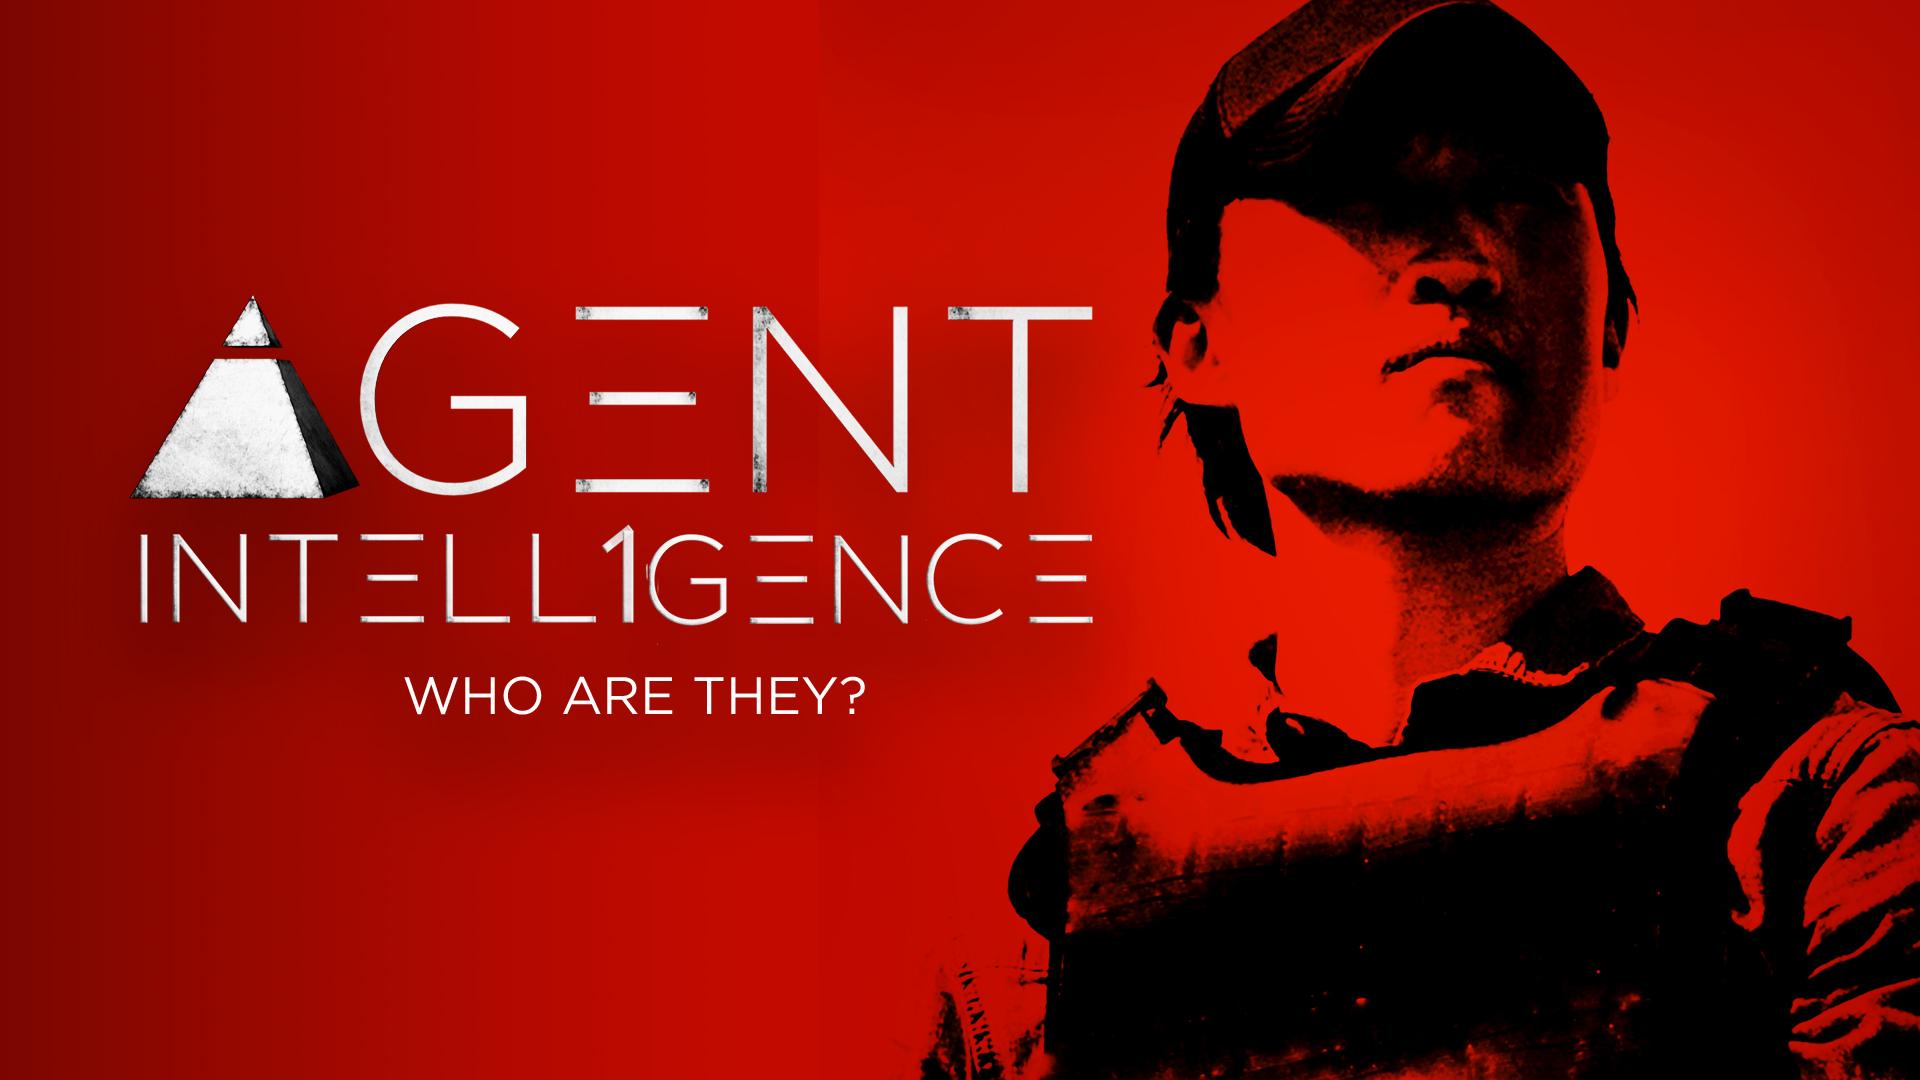 Agent: Intell1gence